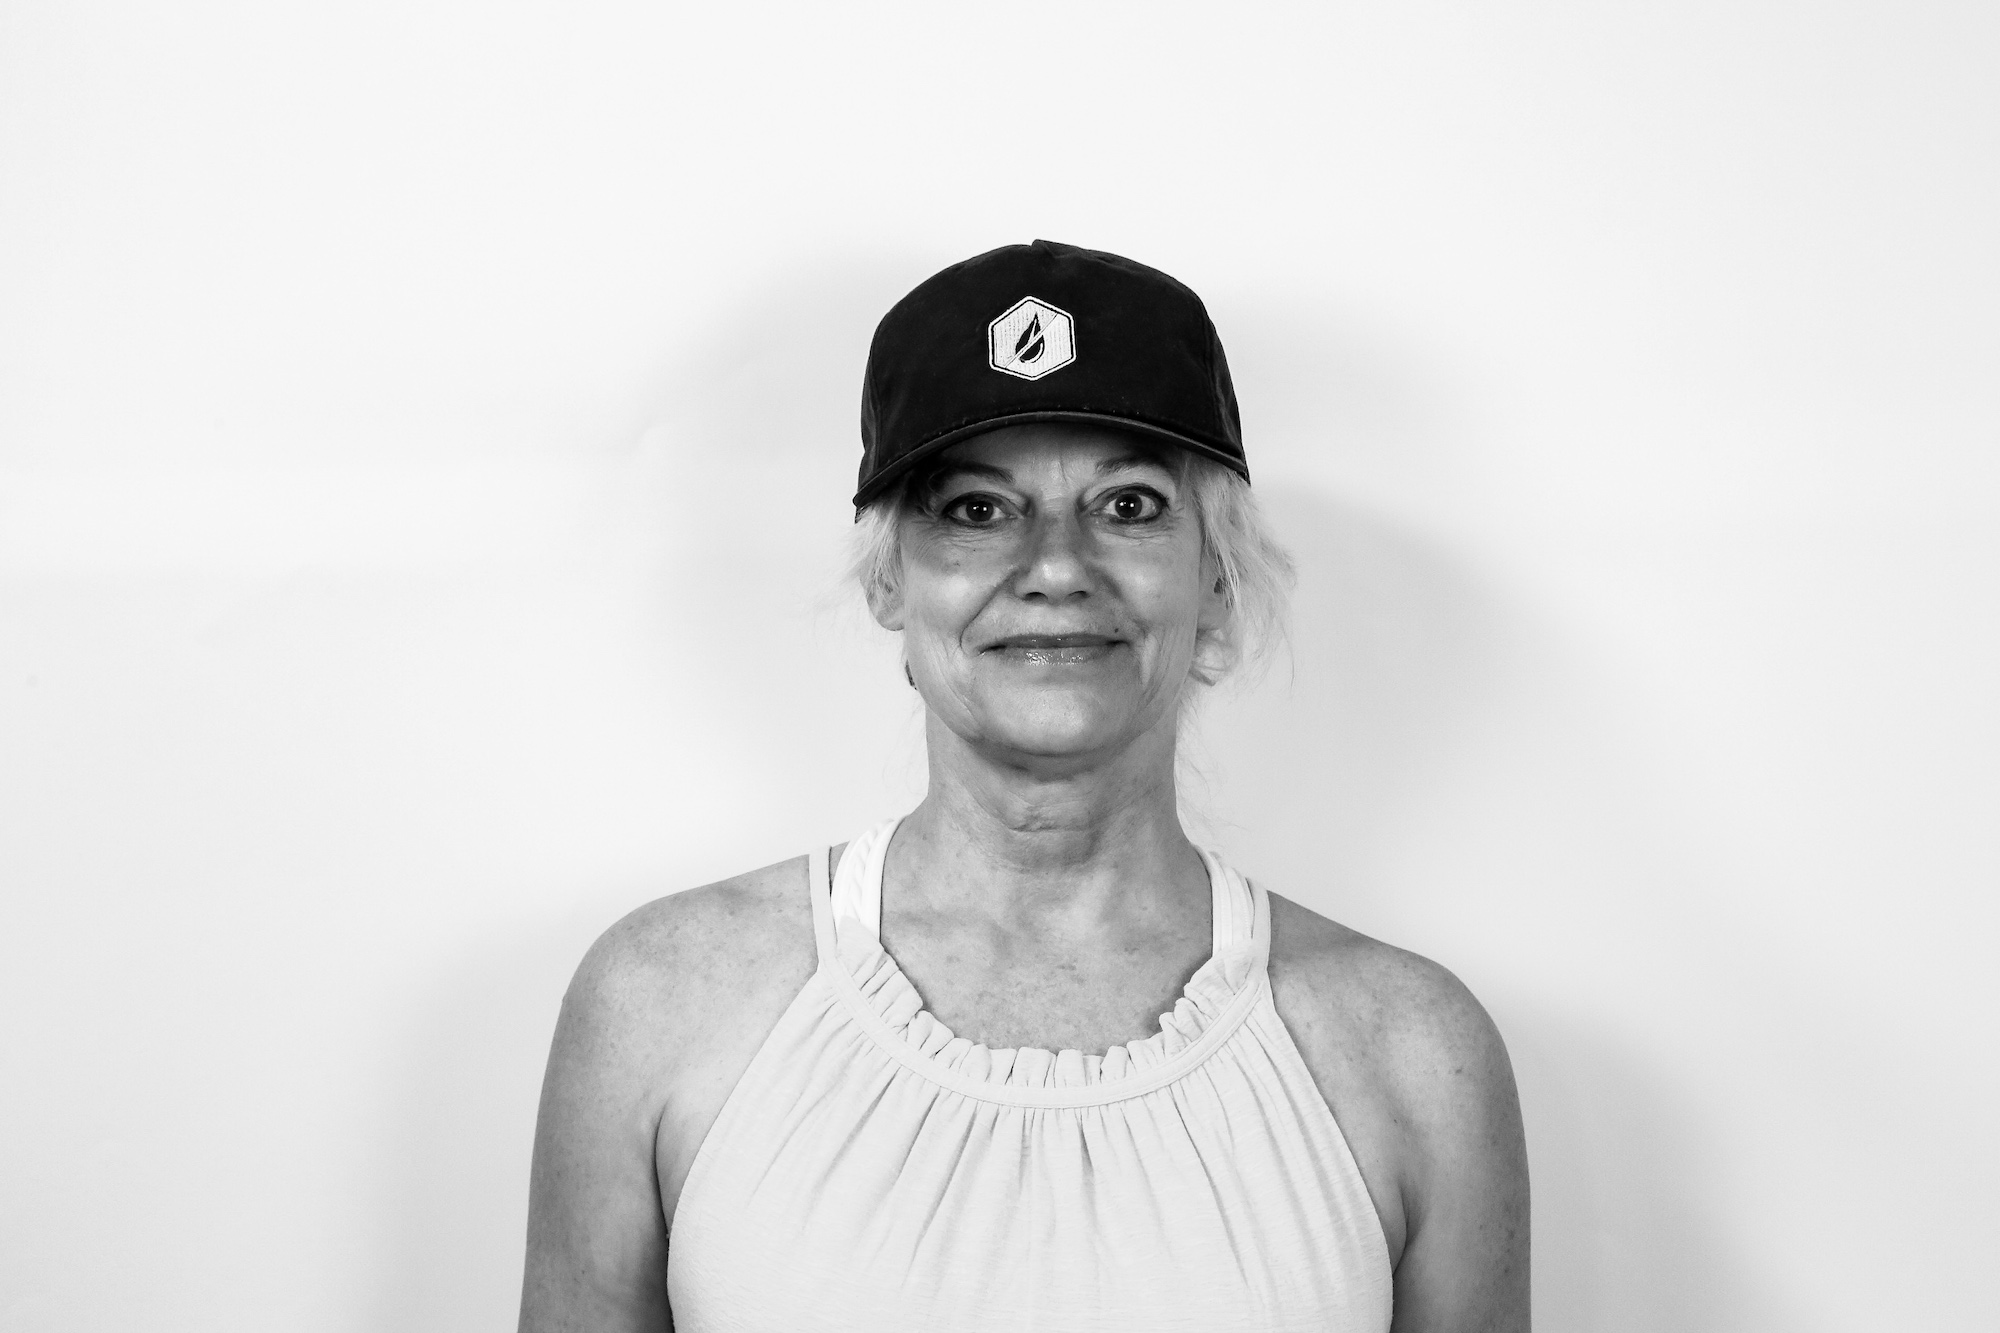 Carrie - Superior Ink team member